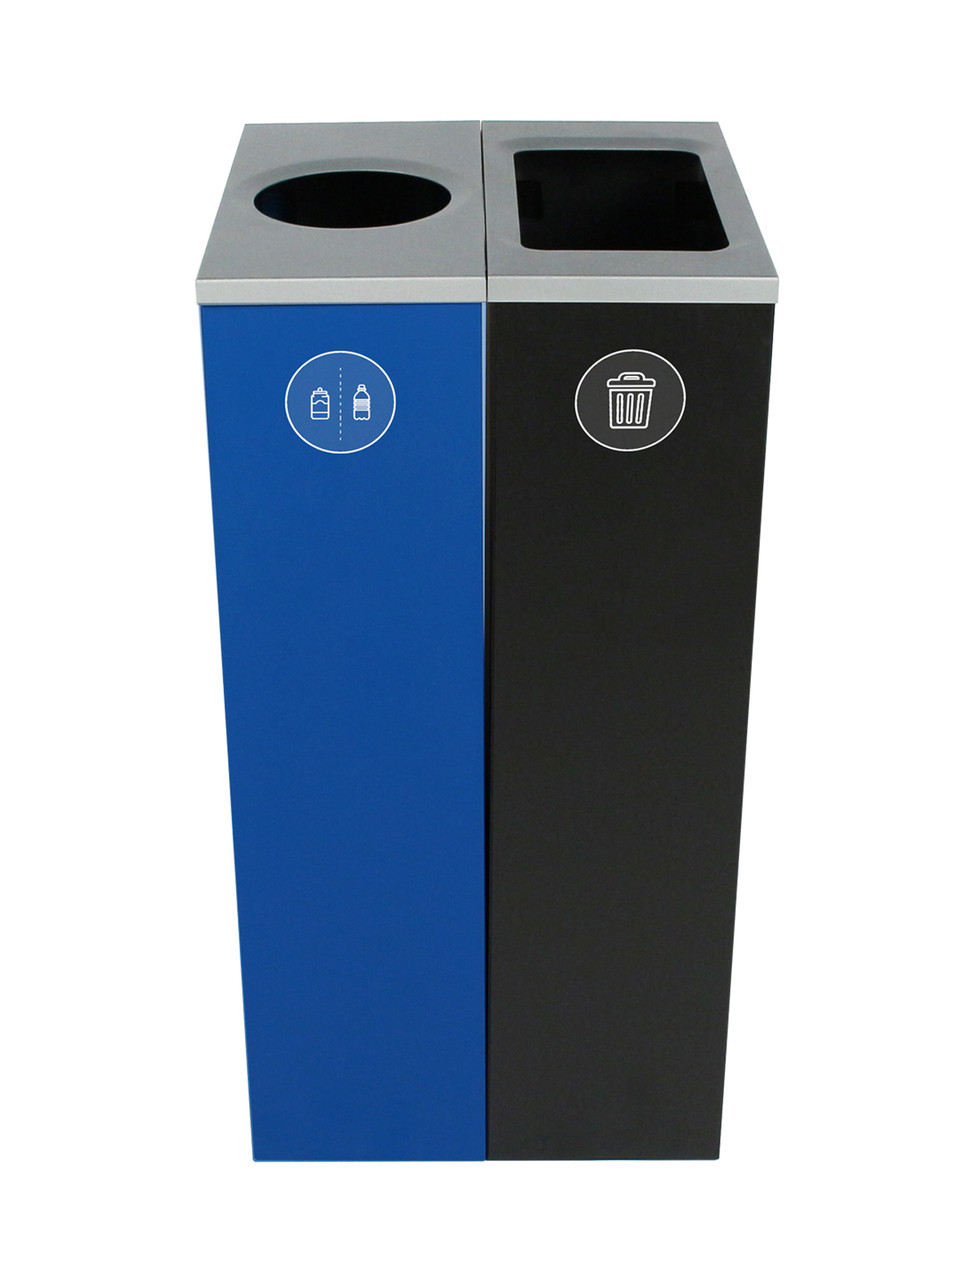 20 Gallon Spectrum Slim Dual Trash Can & Recycle Bin Blue/Black 8107093-14